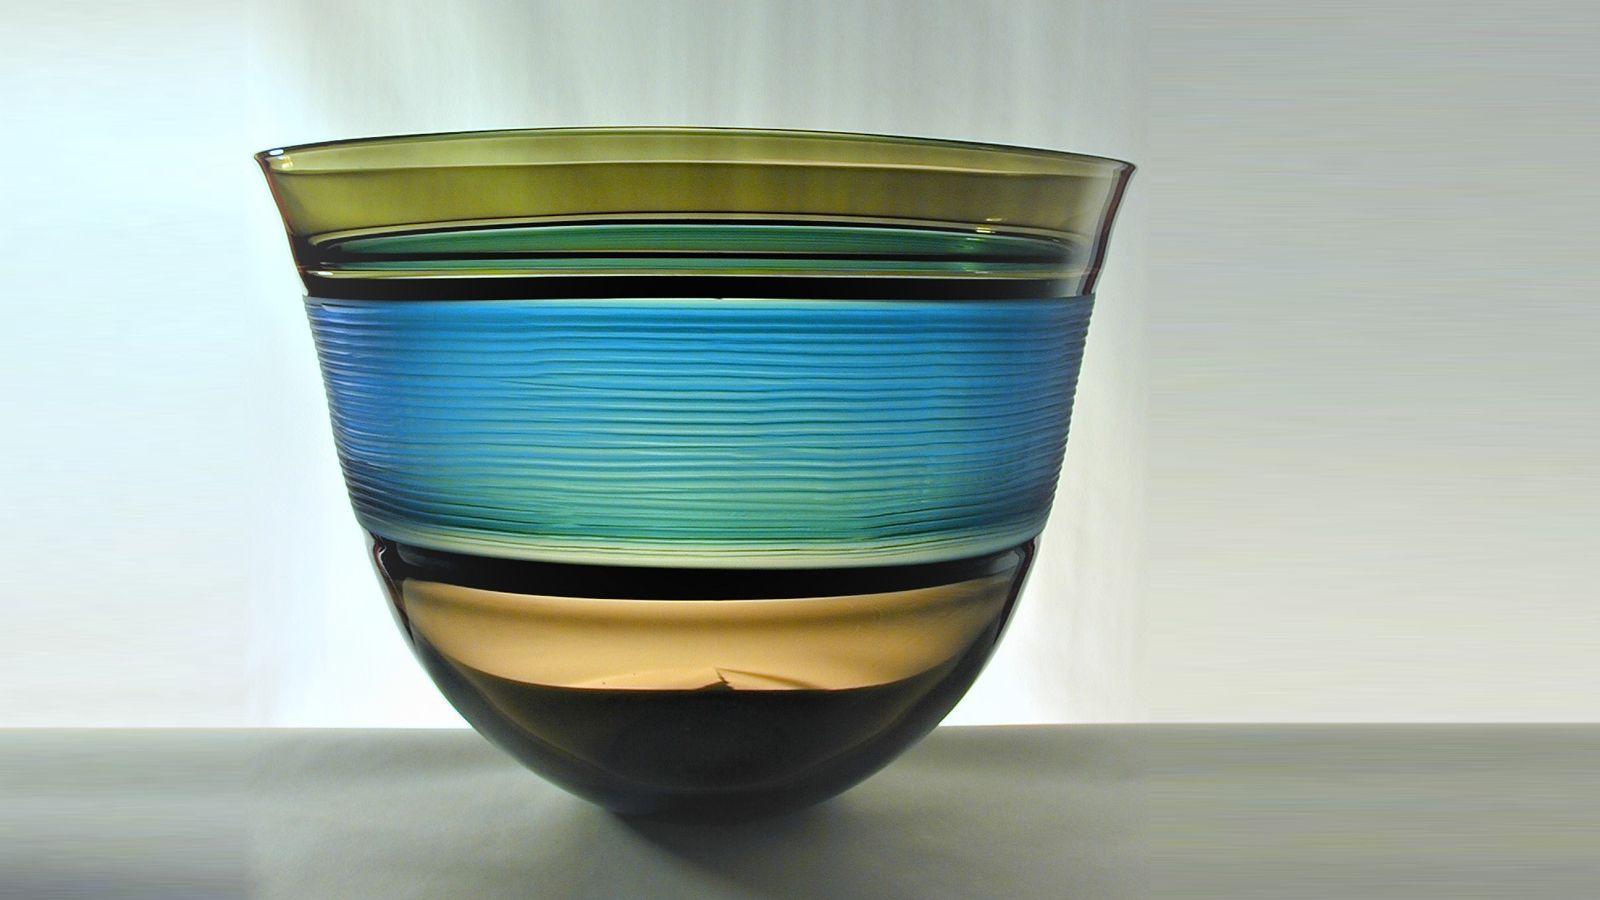 Stewart Hearn Hand Blown Glass Strata Bowl, Olive, Black & Turquoise